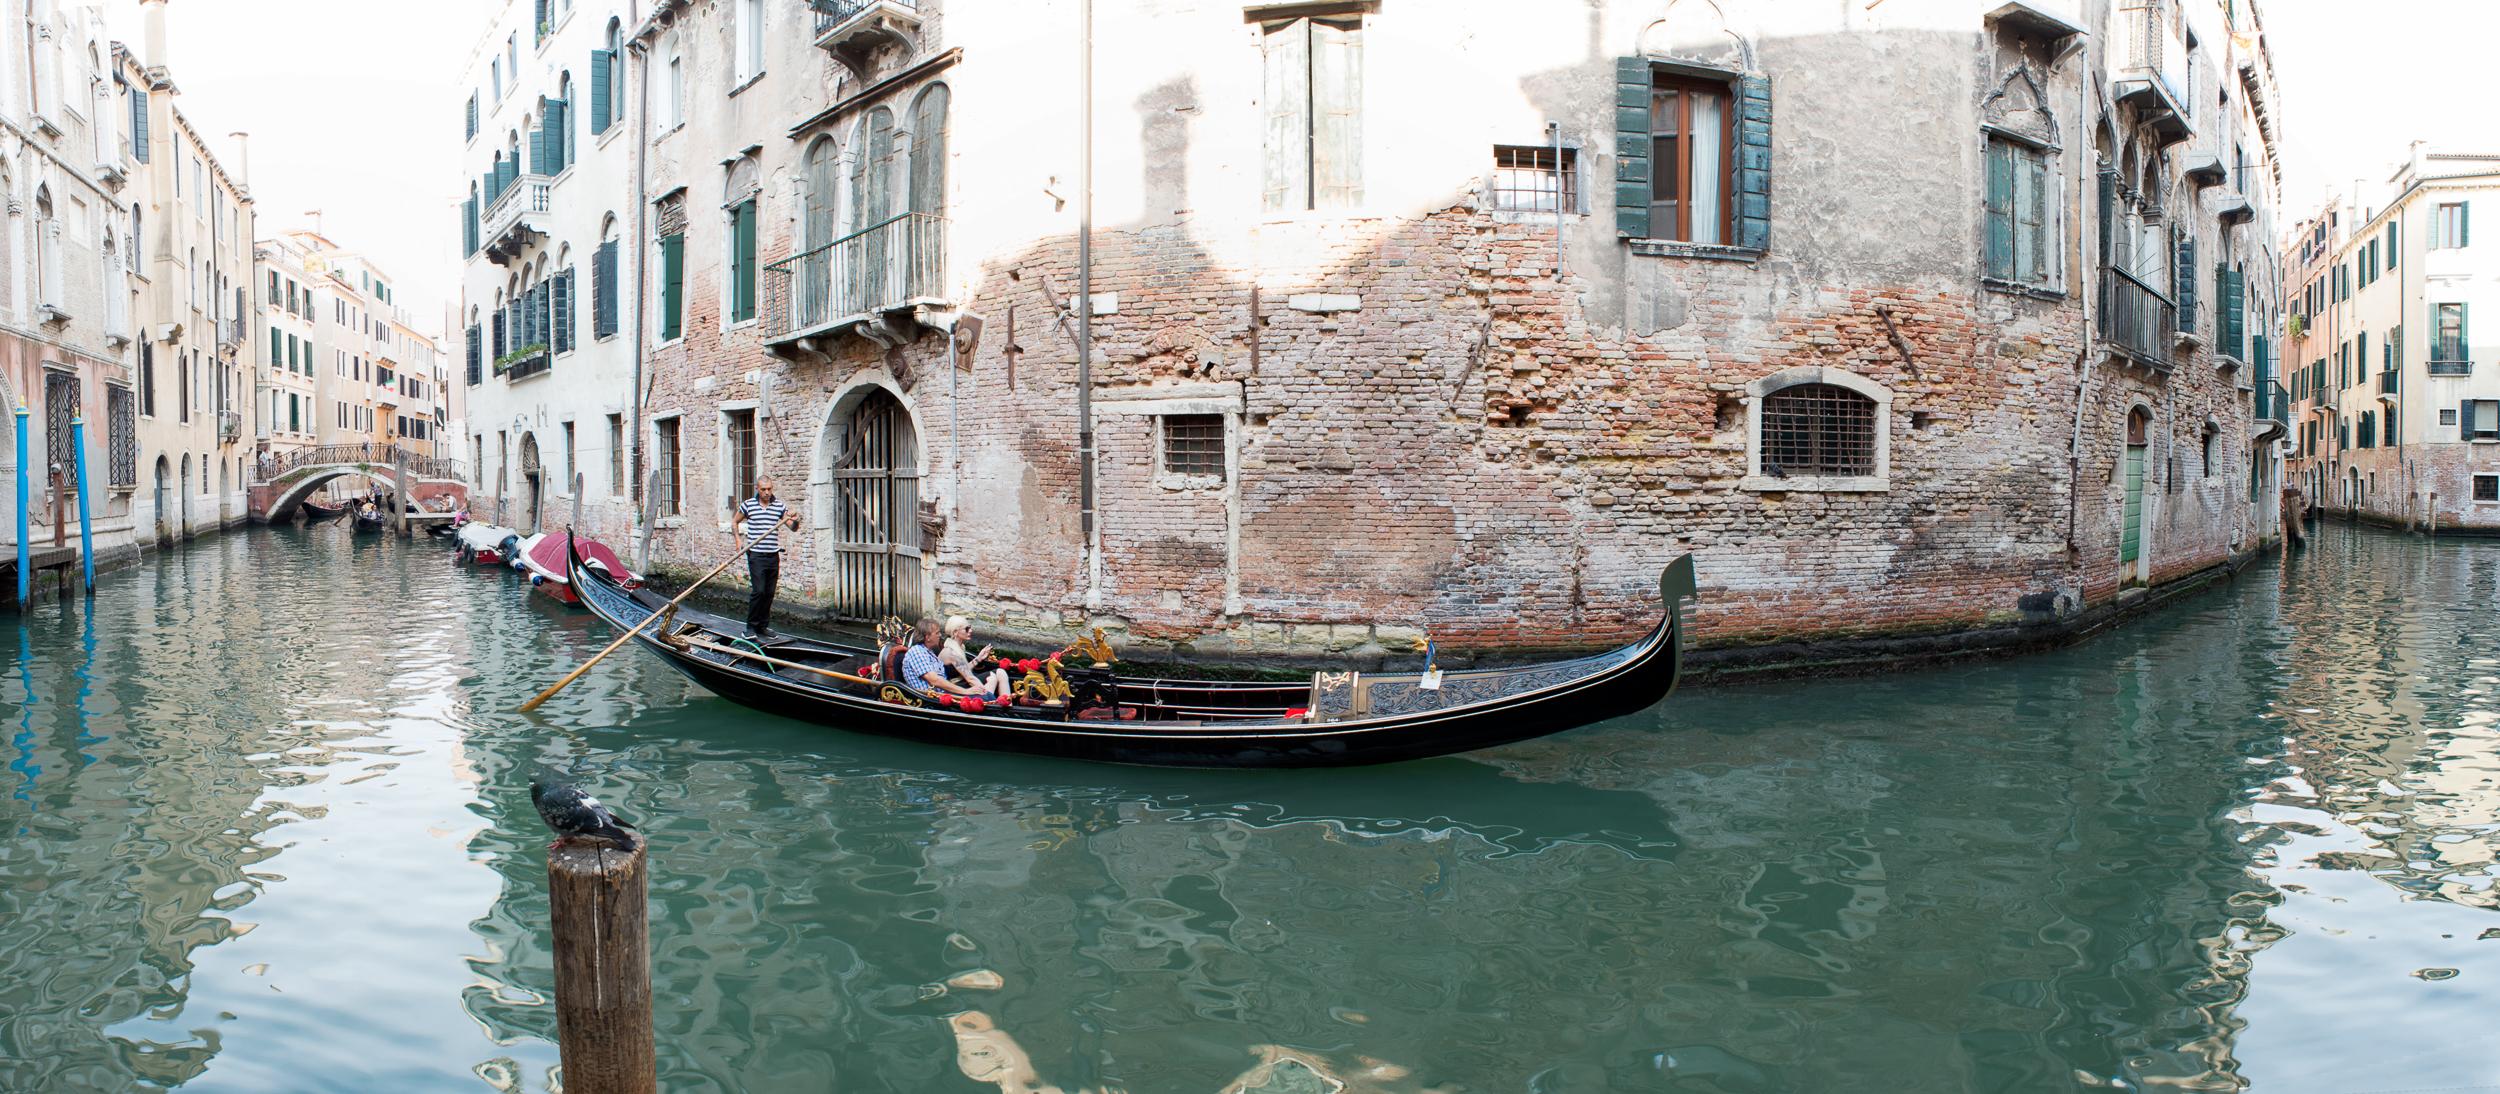 Venice Canal Pano7x16.JPG